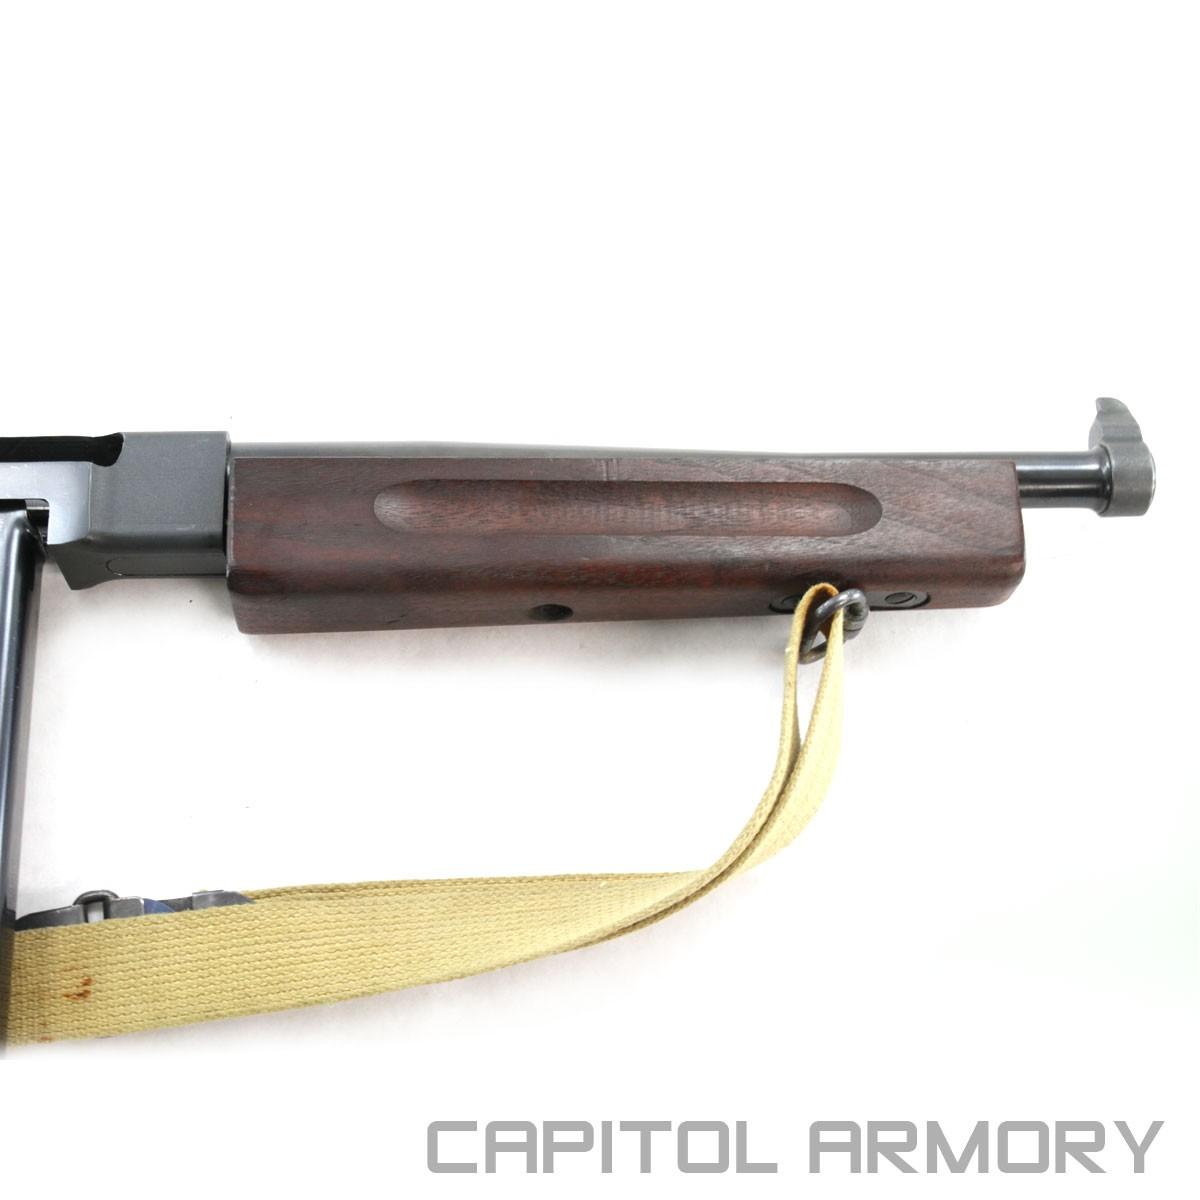 Auto Ordnance M1 Thompson - Capitol Armory